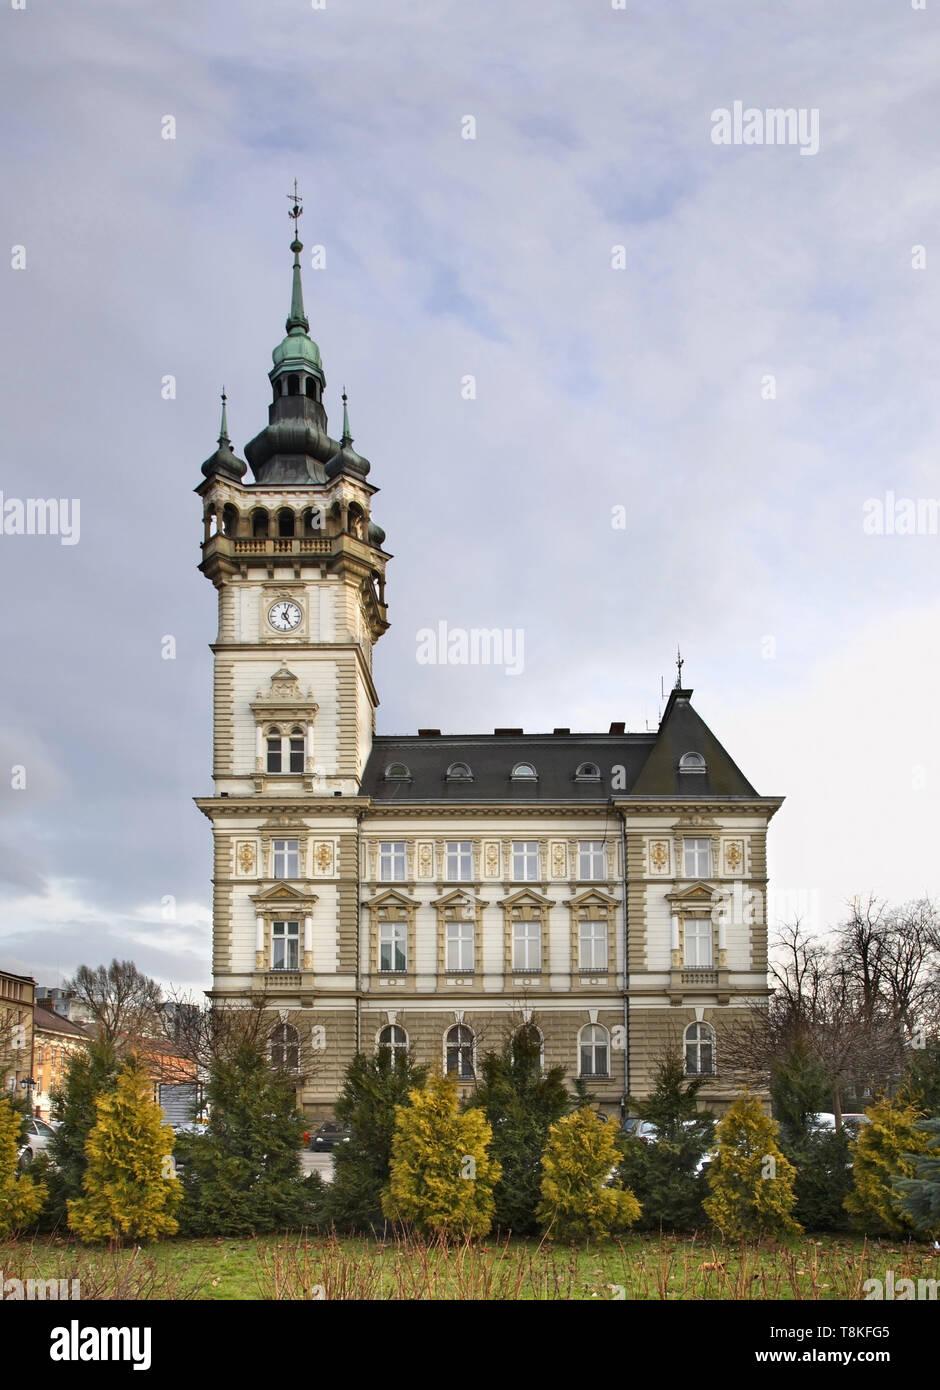 Town hall in Bielsko-Biala. Poland - Stock Image